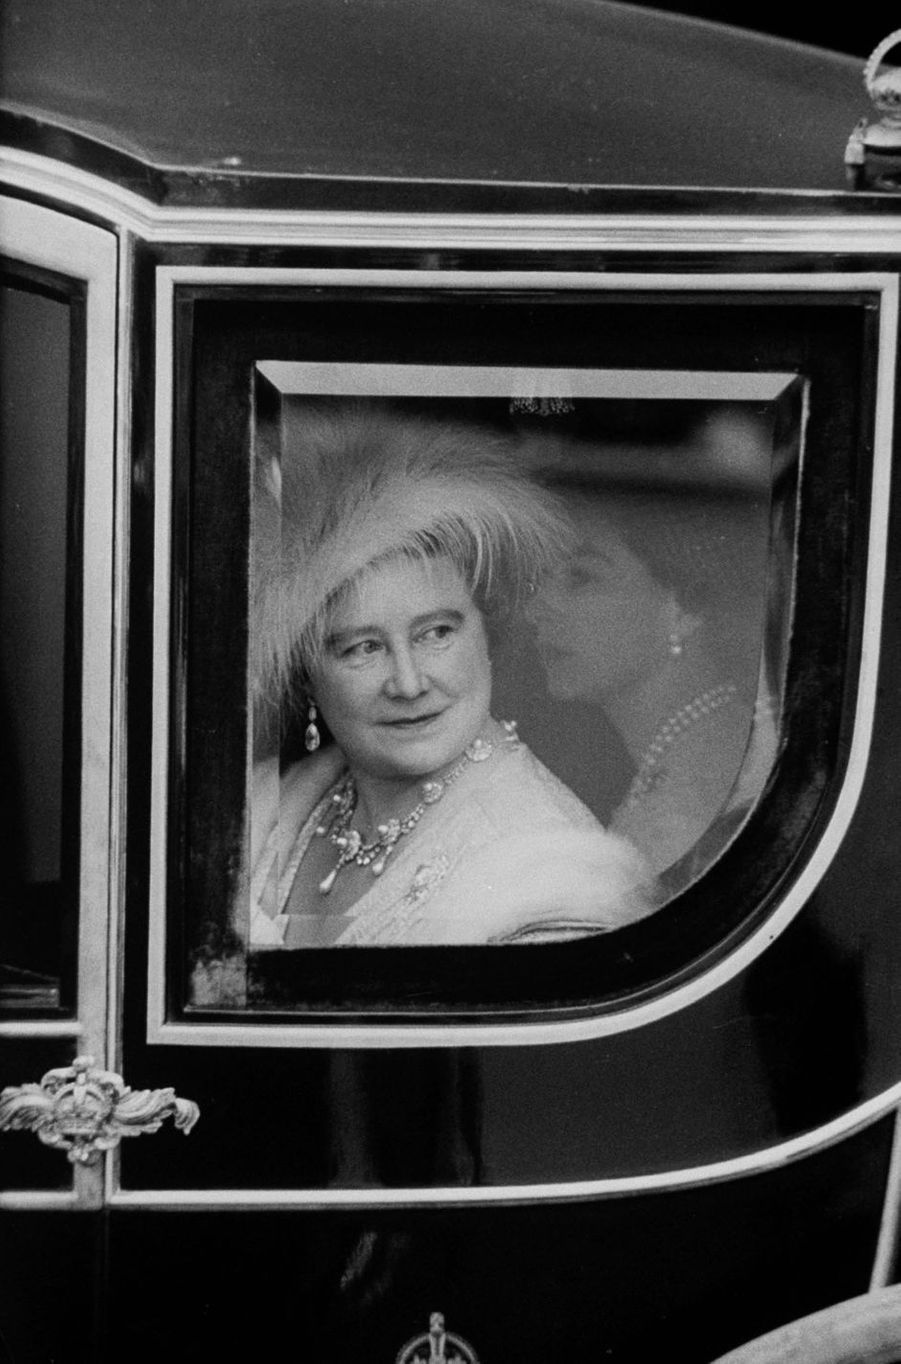 La Queen Mum et la reine Elizabeth II, le 6 mai 1960